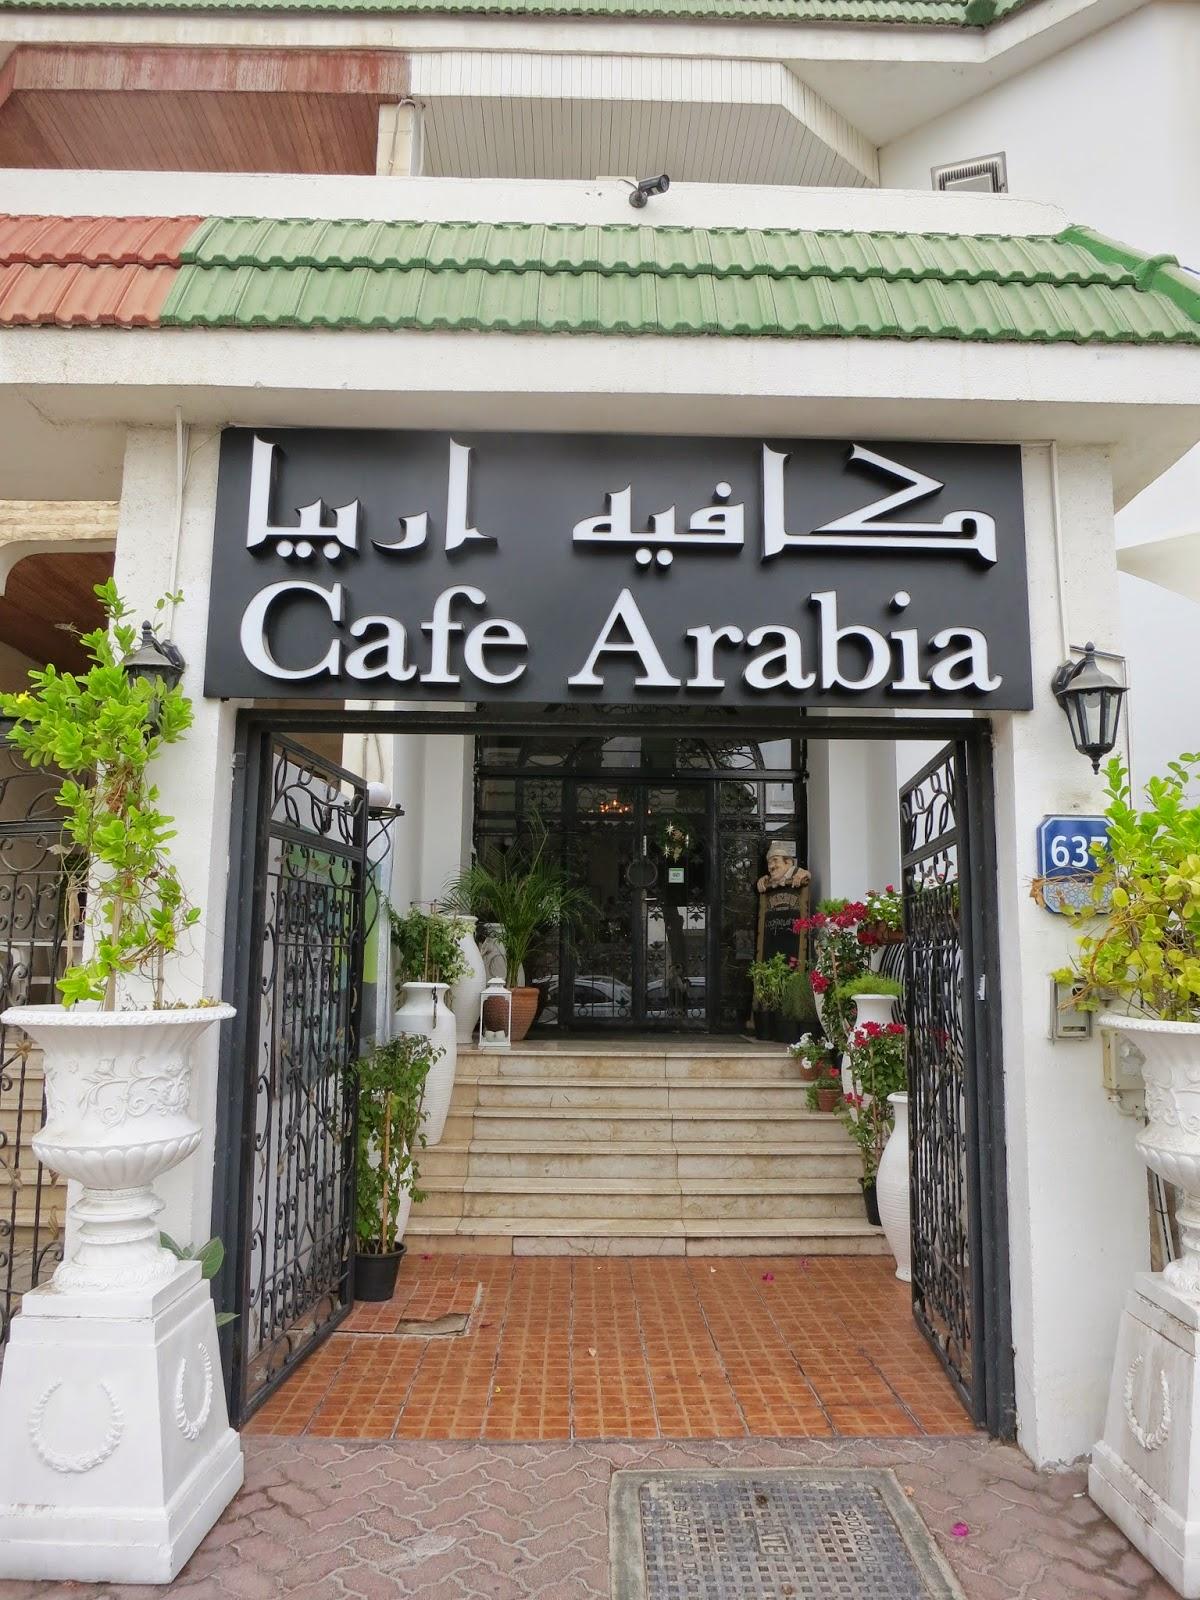 Cafe Arabia Abu Dhabi Menu